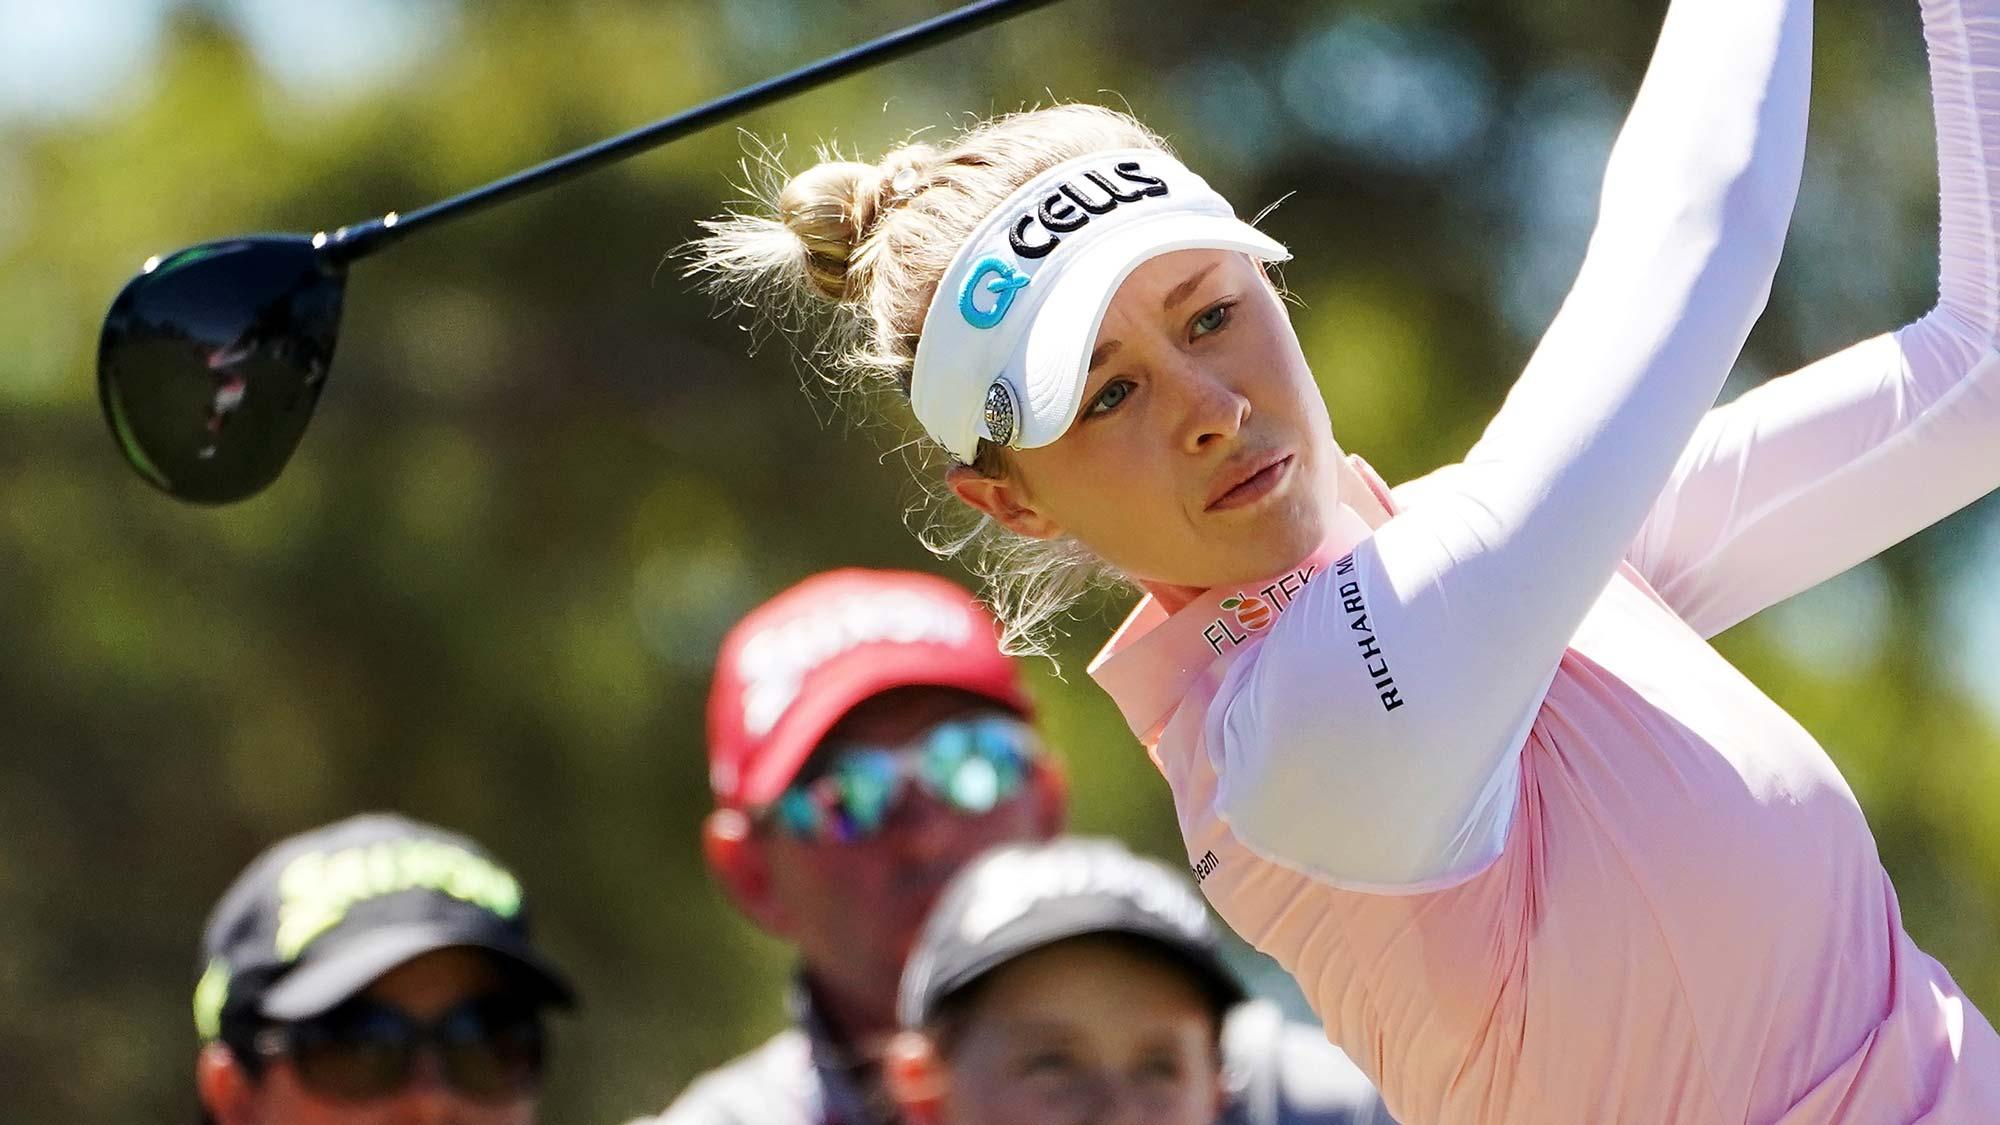 australian open golf - photo #33